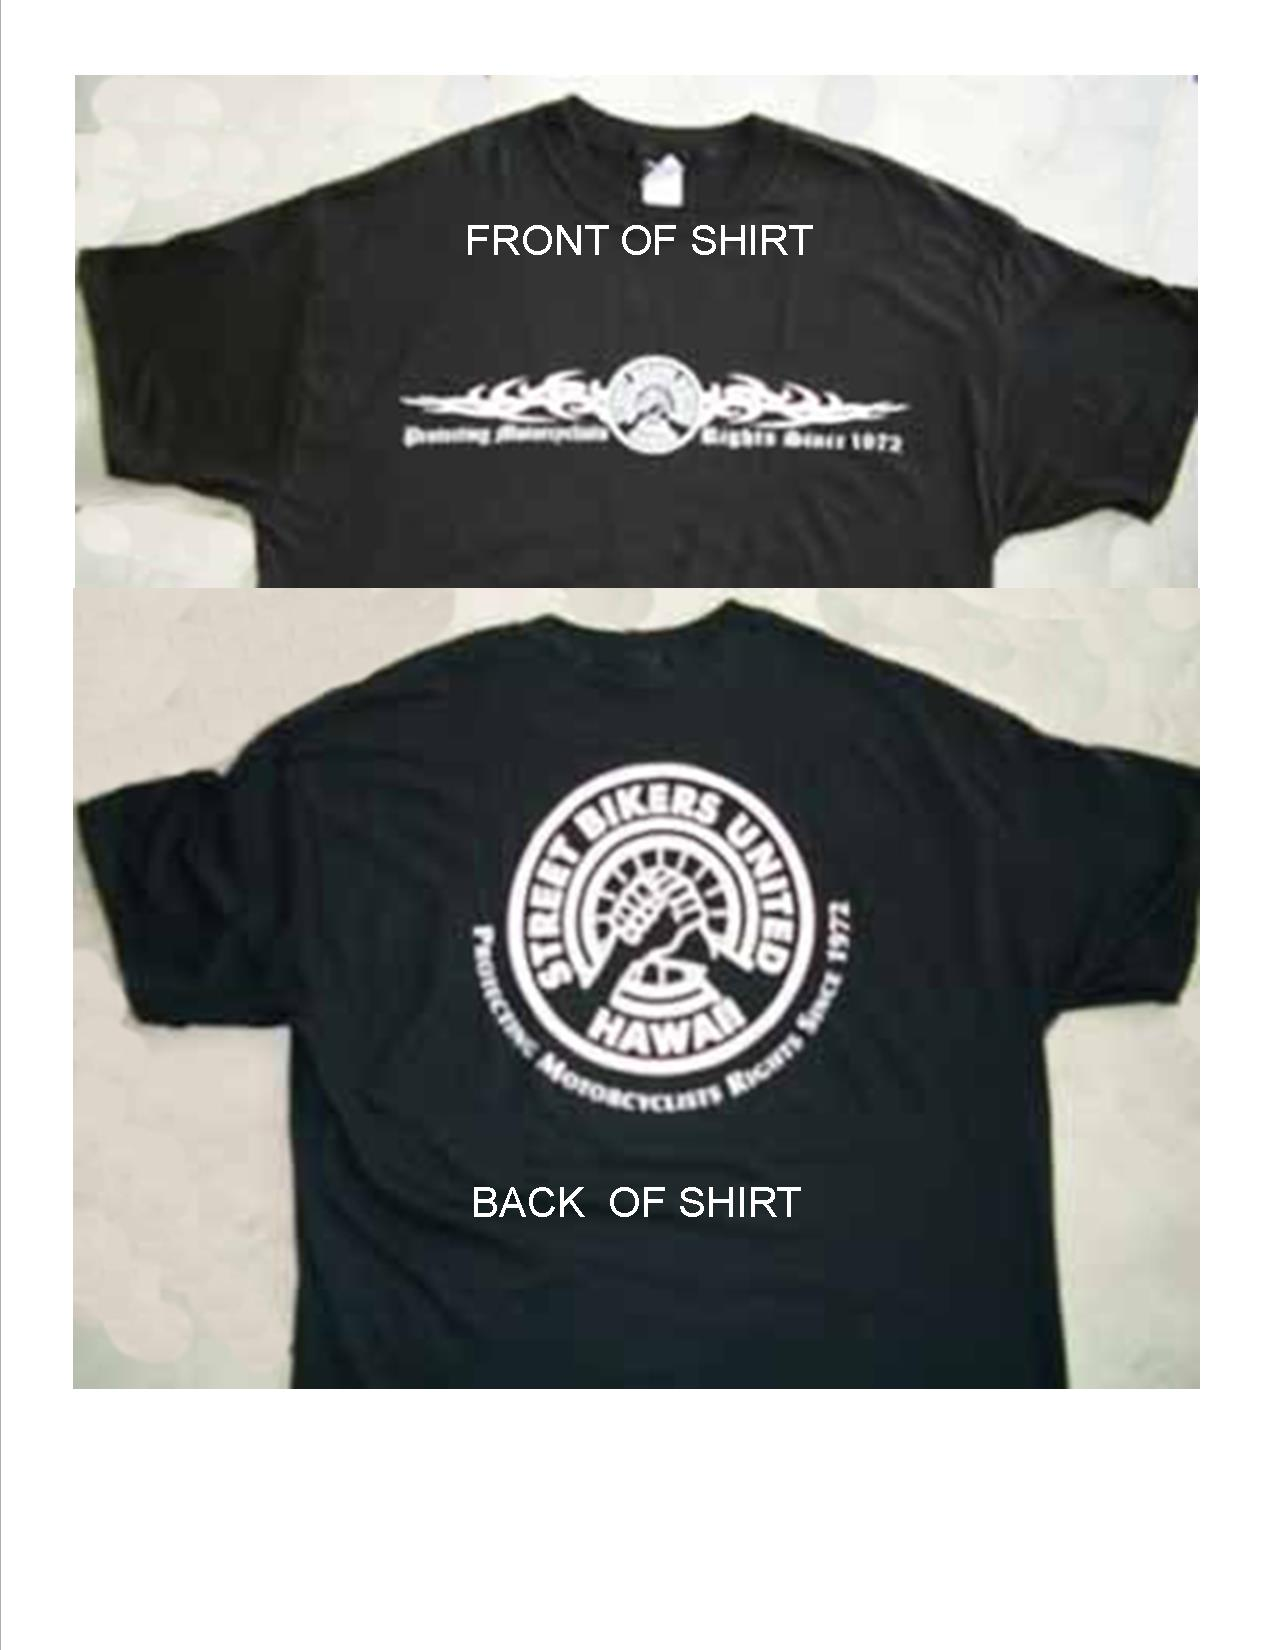 New SBU Shirts